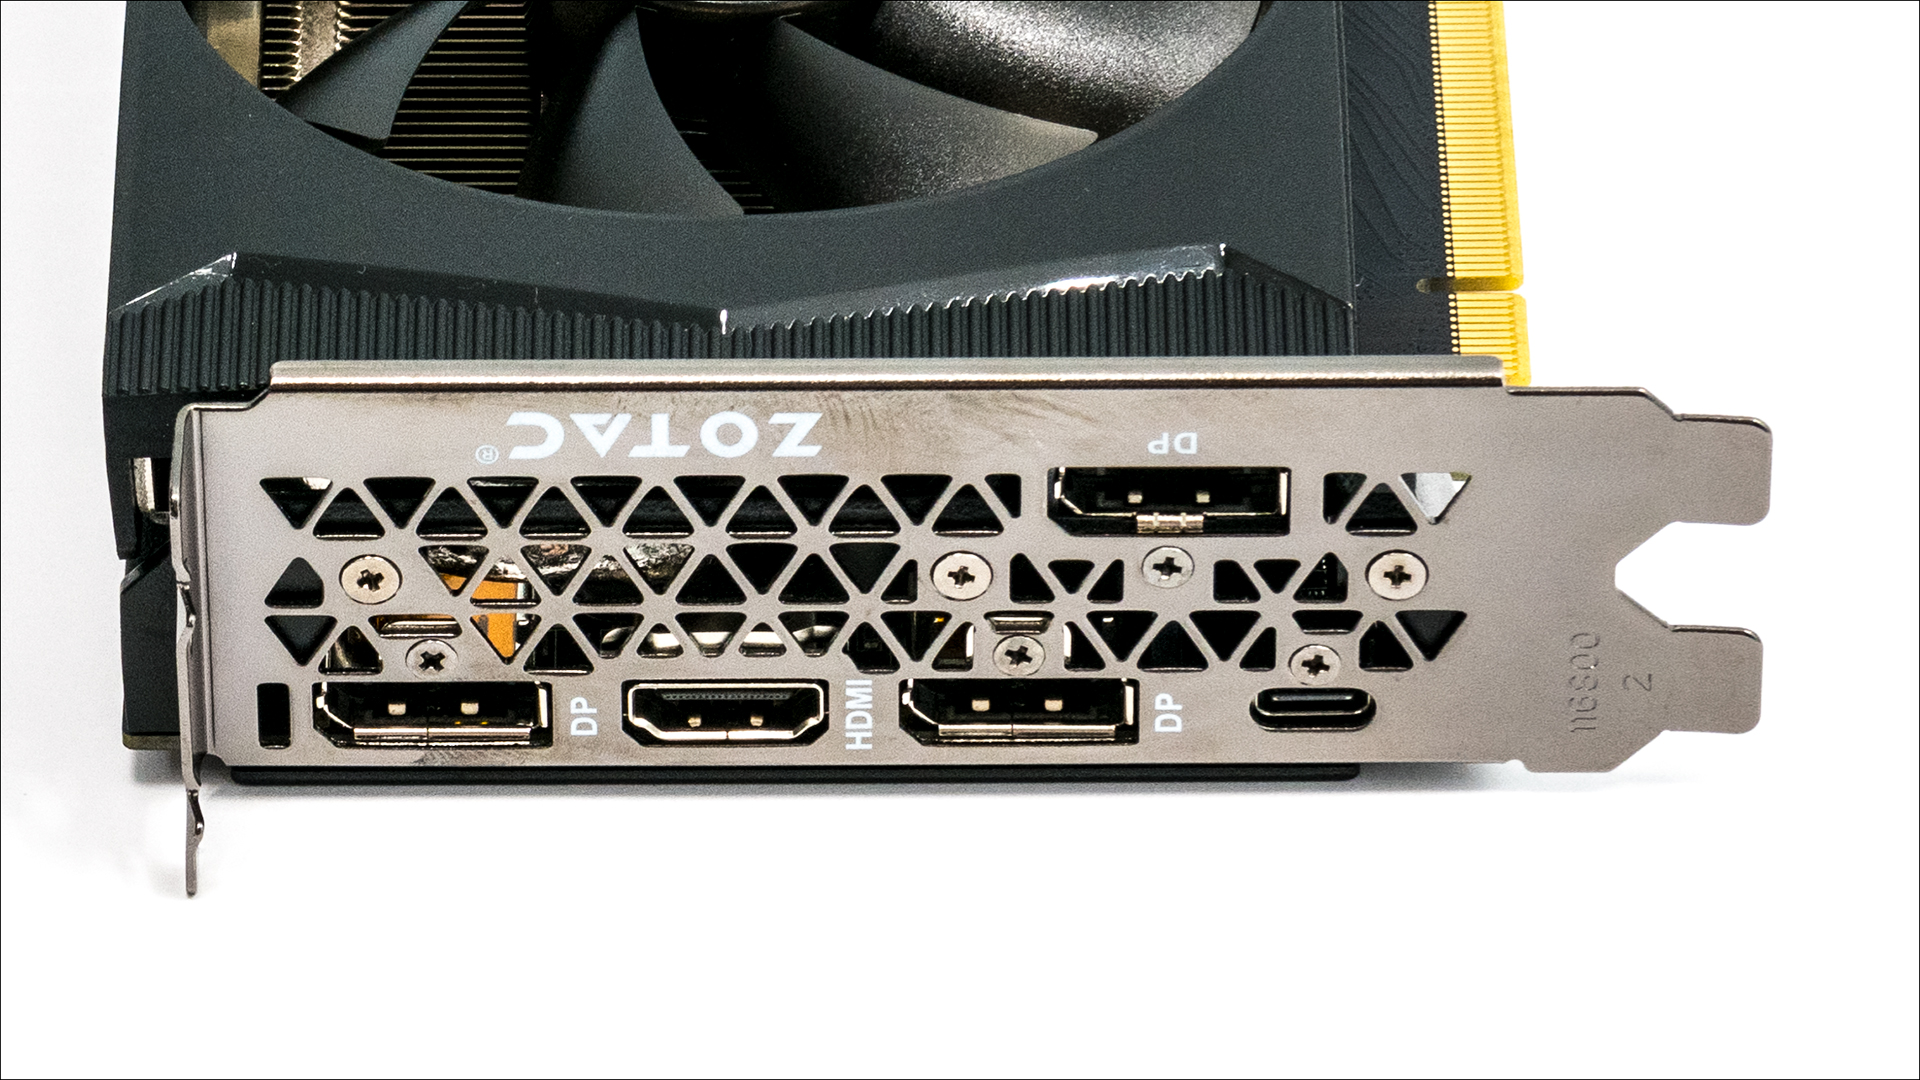 Zotac Gaming GeForce RTX 2070 AMP: Smaller design, but better